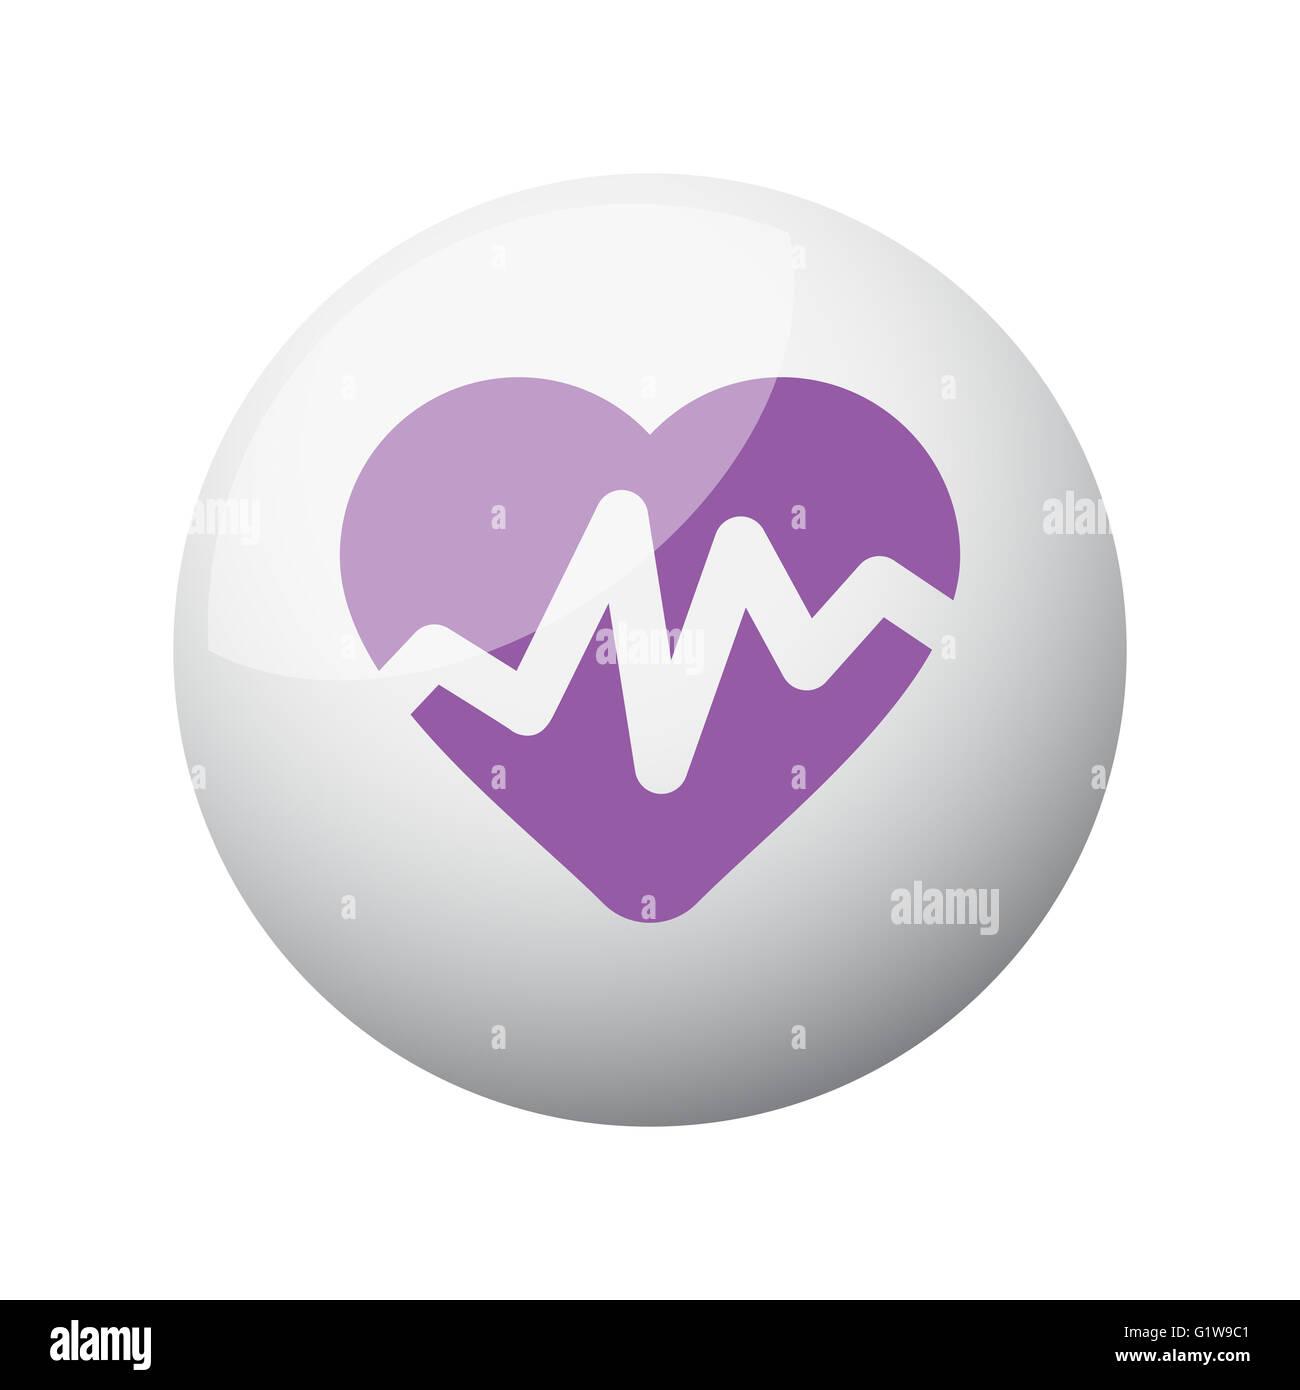 Flat purple heart rate pulse icon on 3d sphere stock photo flat purple heart rate pulse icon on 3d sphere buycottarizona